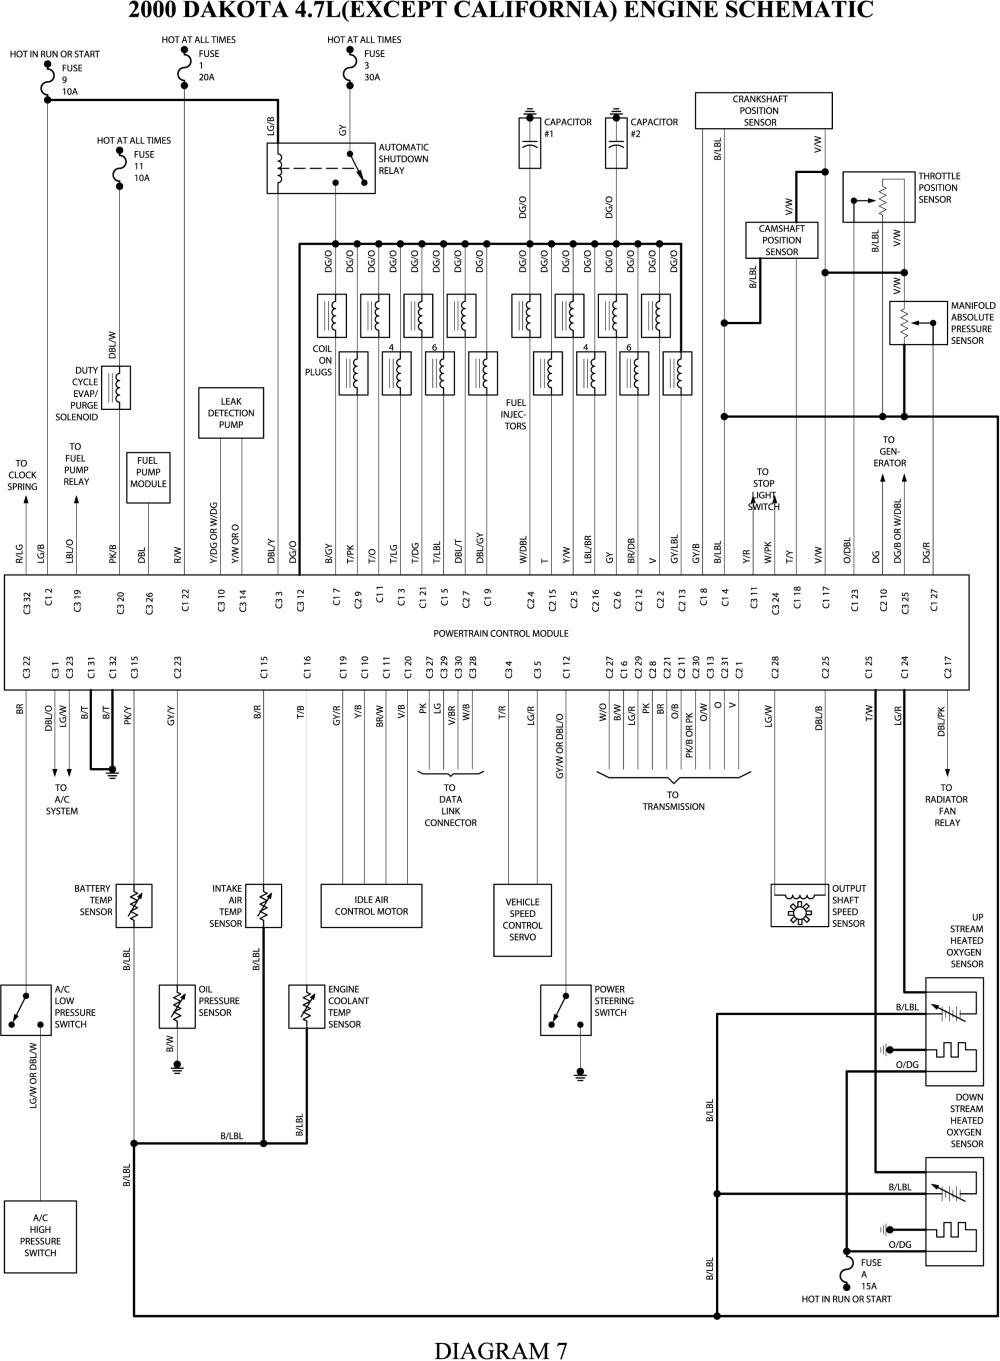 Dodge Ram 2500 Tail Light Wiring | Wiring Library - 99 Dodge Ram Headlight Wiring Diagram